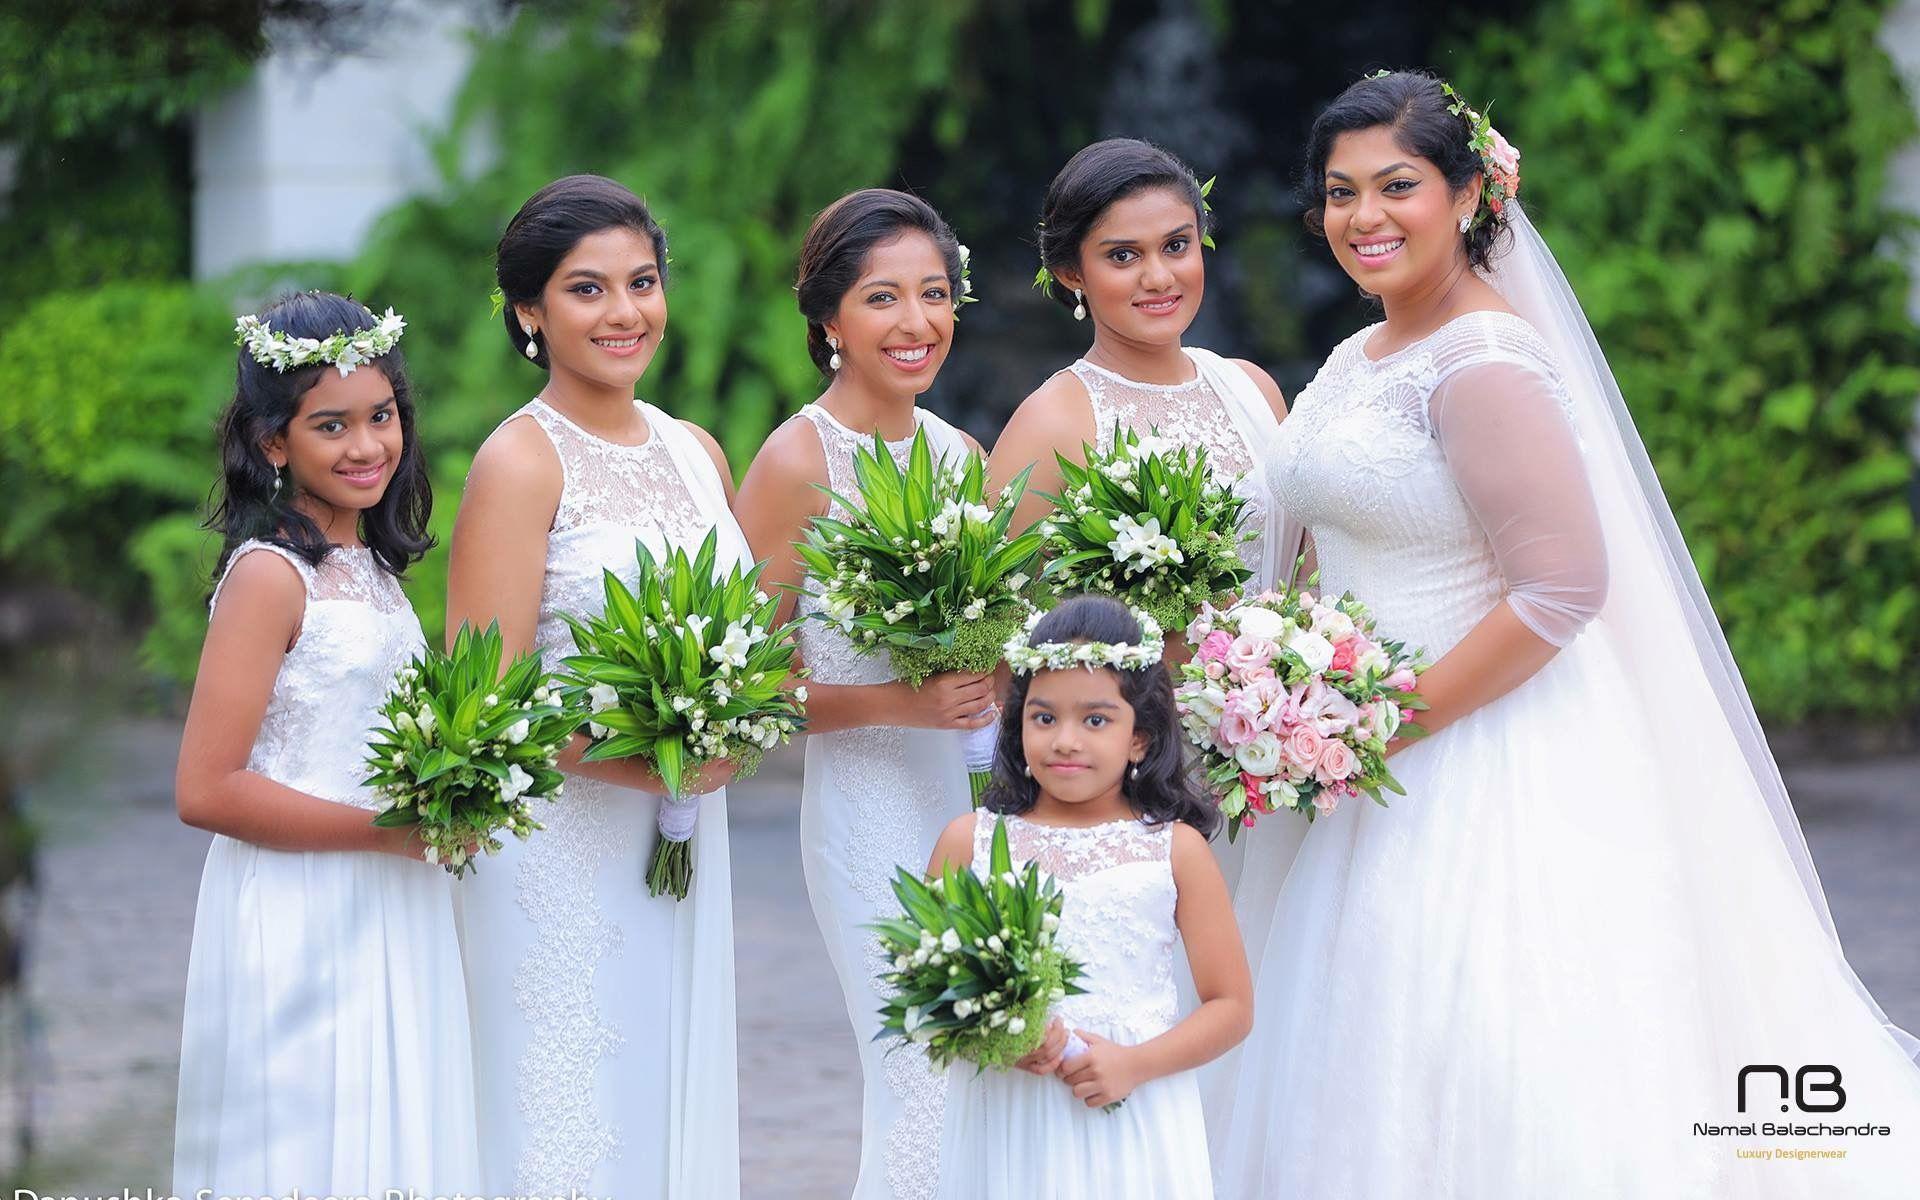 Pin By Imesha Grero On Bridal Bride Bridal Dresses Wedding Bride